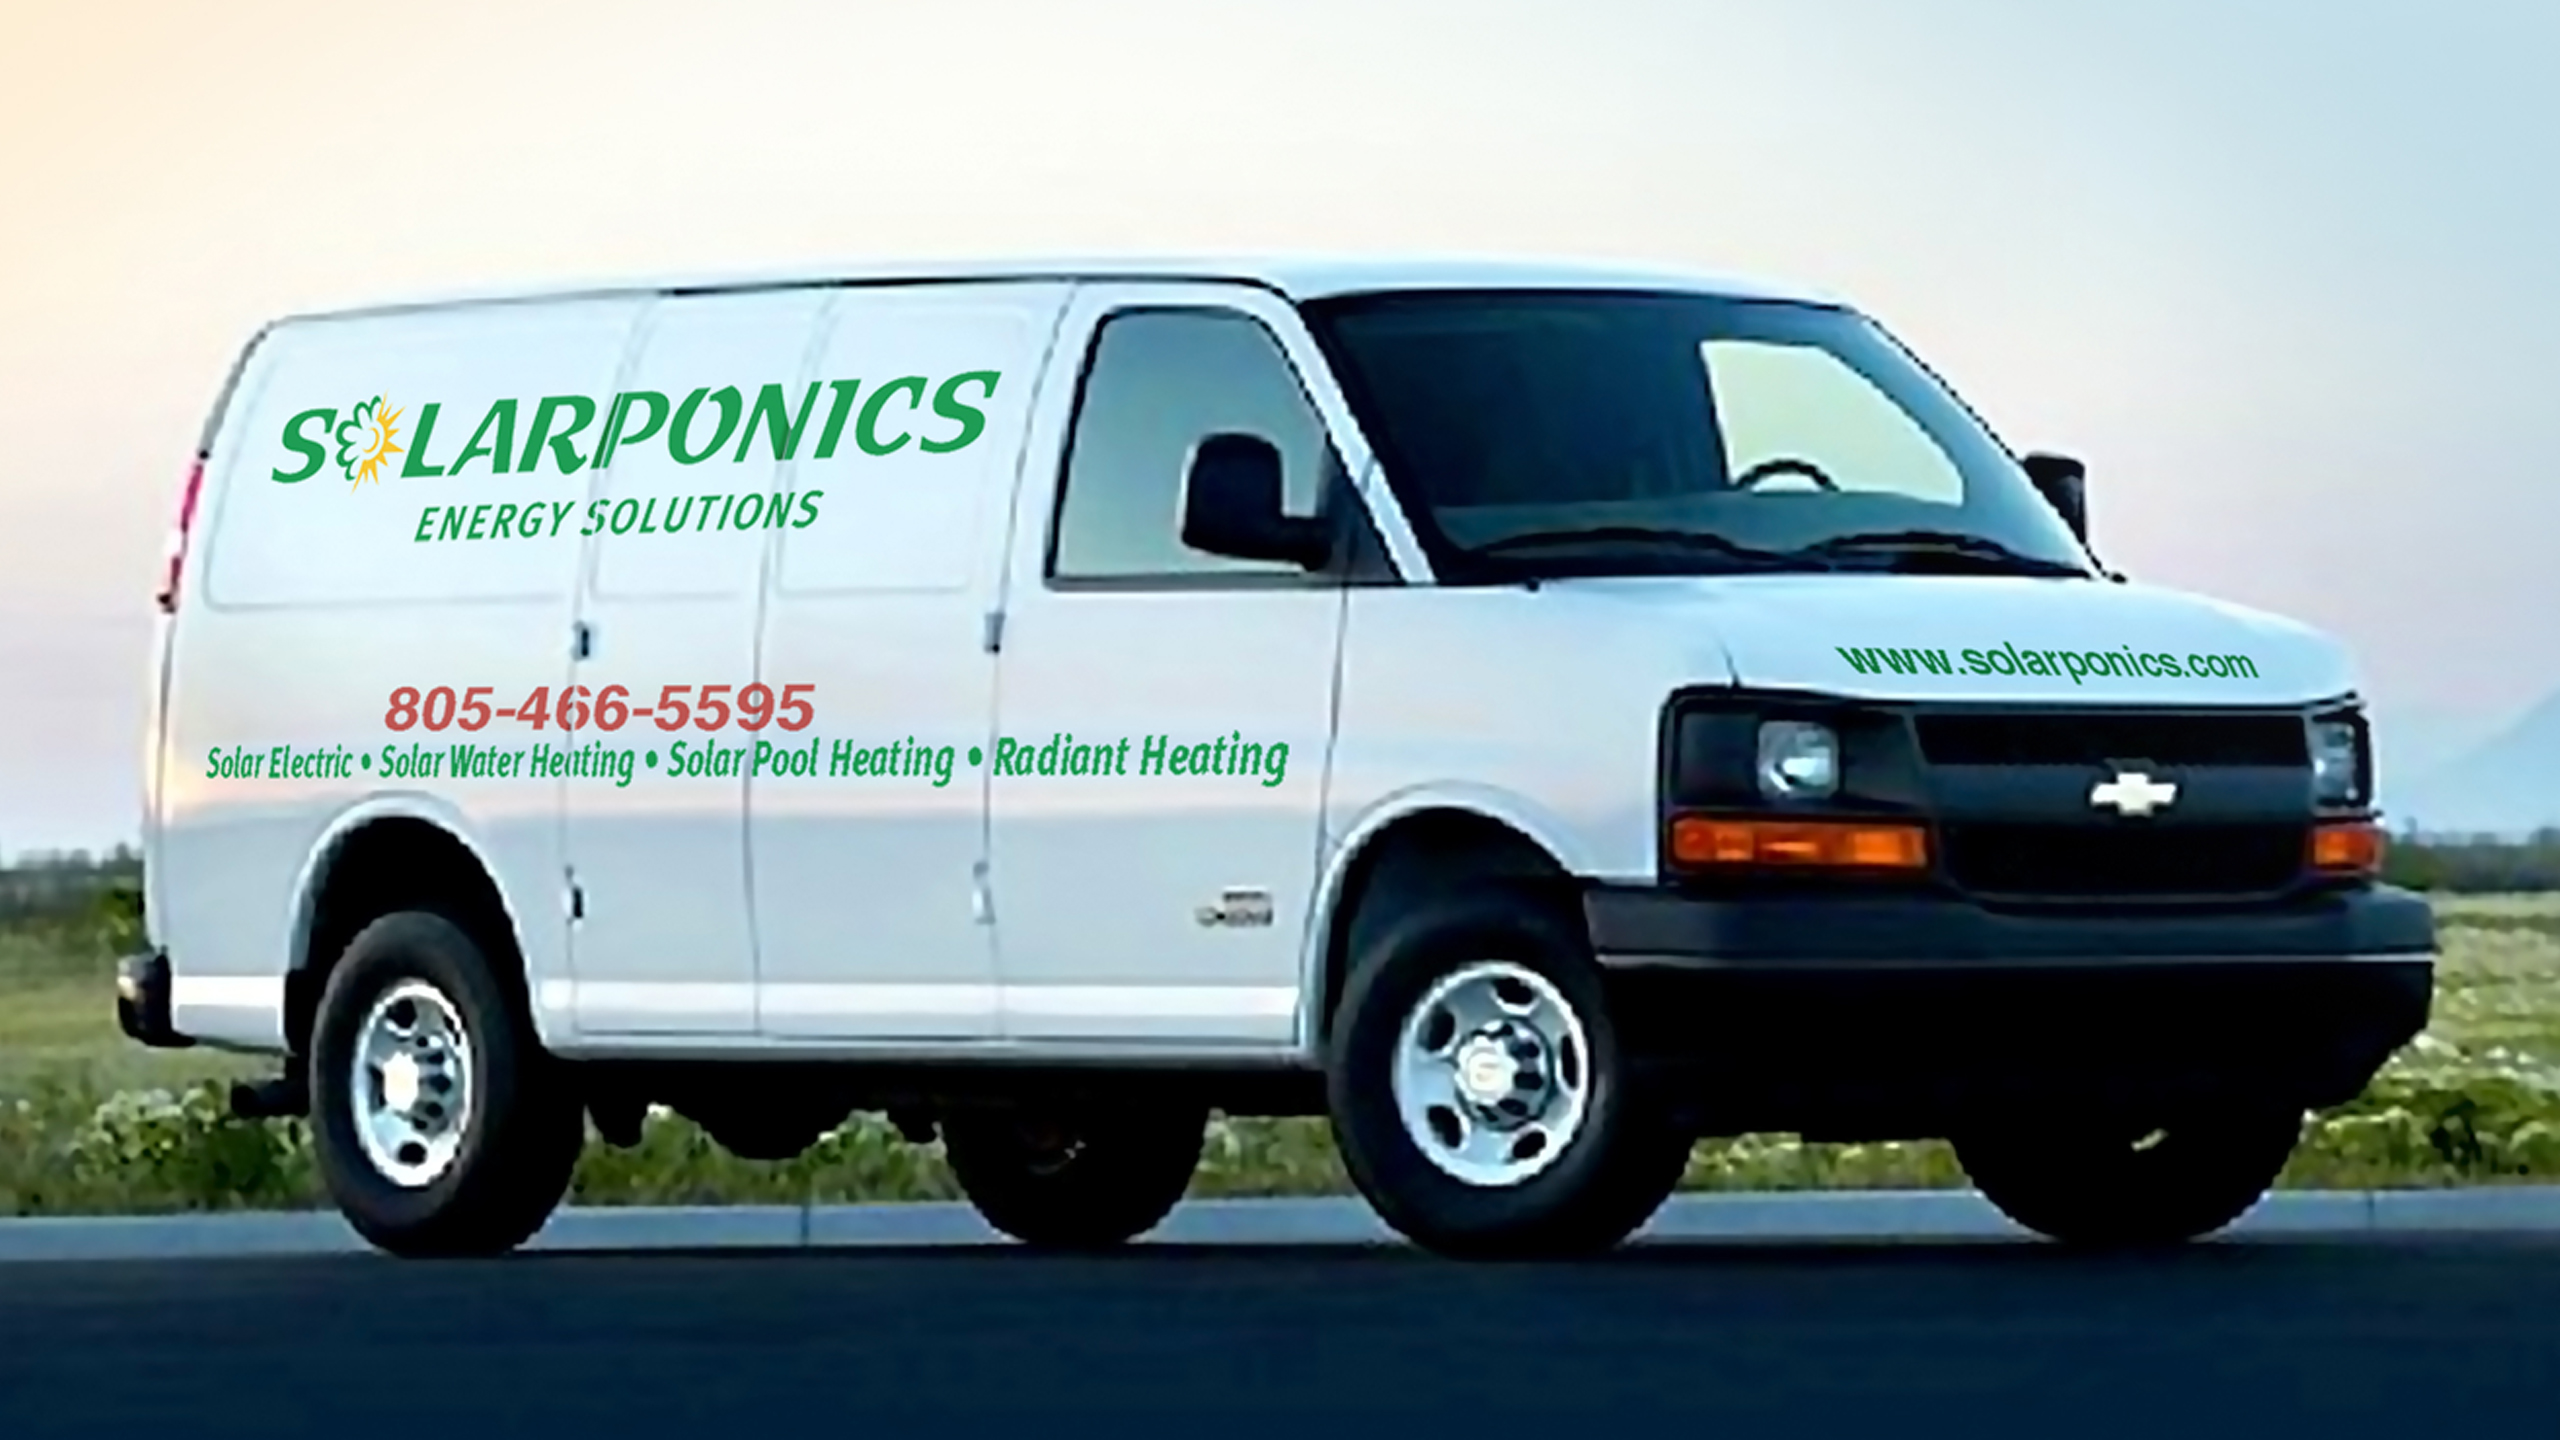 solarponics service van